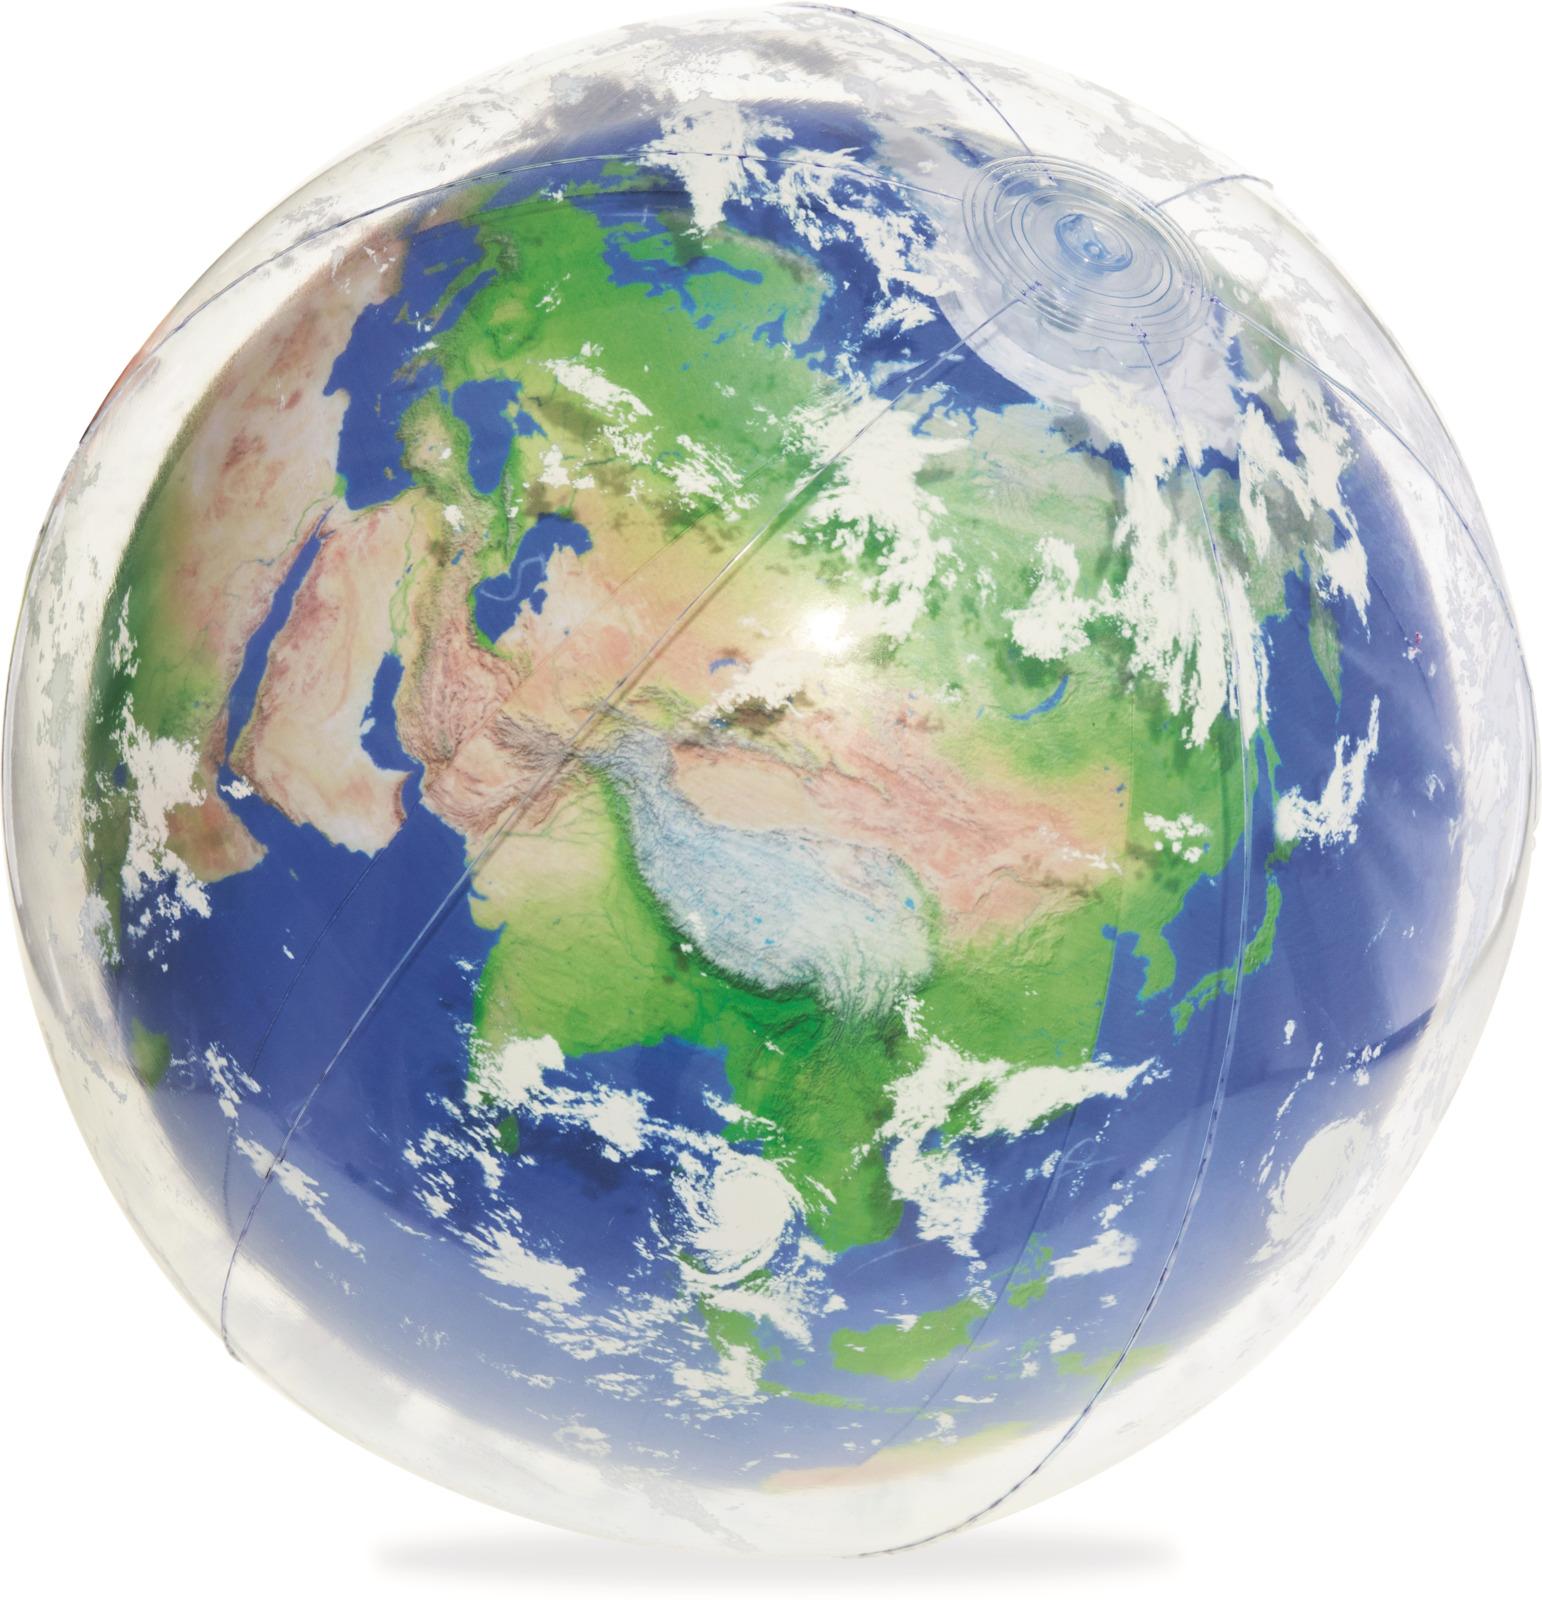 Фото - Мяч детский Bestway Земля, диаметр 61 см боди детский luvable friends 60325 f бирюзовый р 55 61